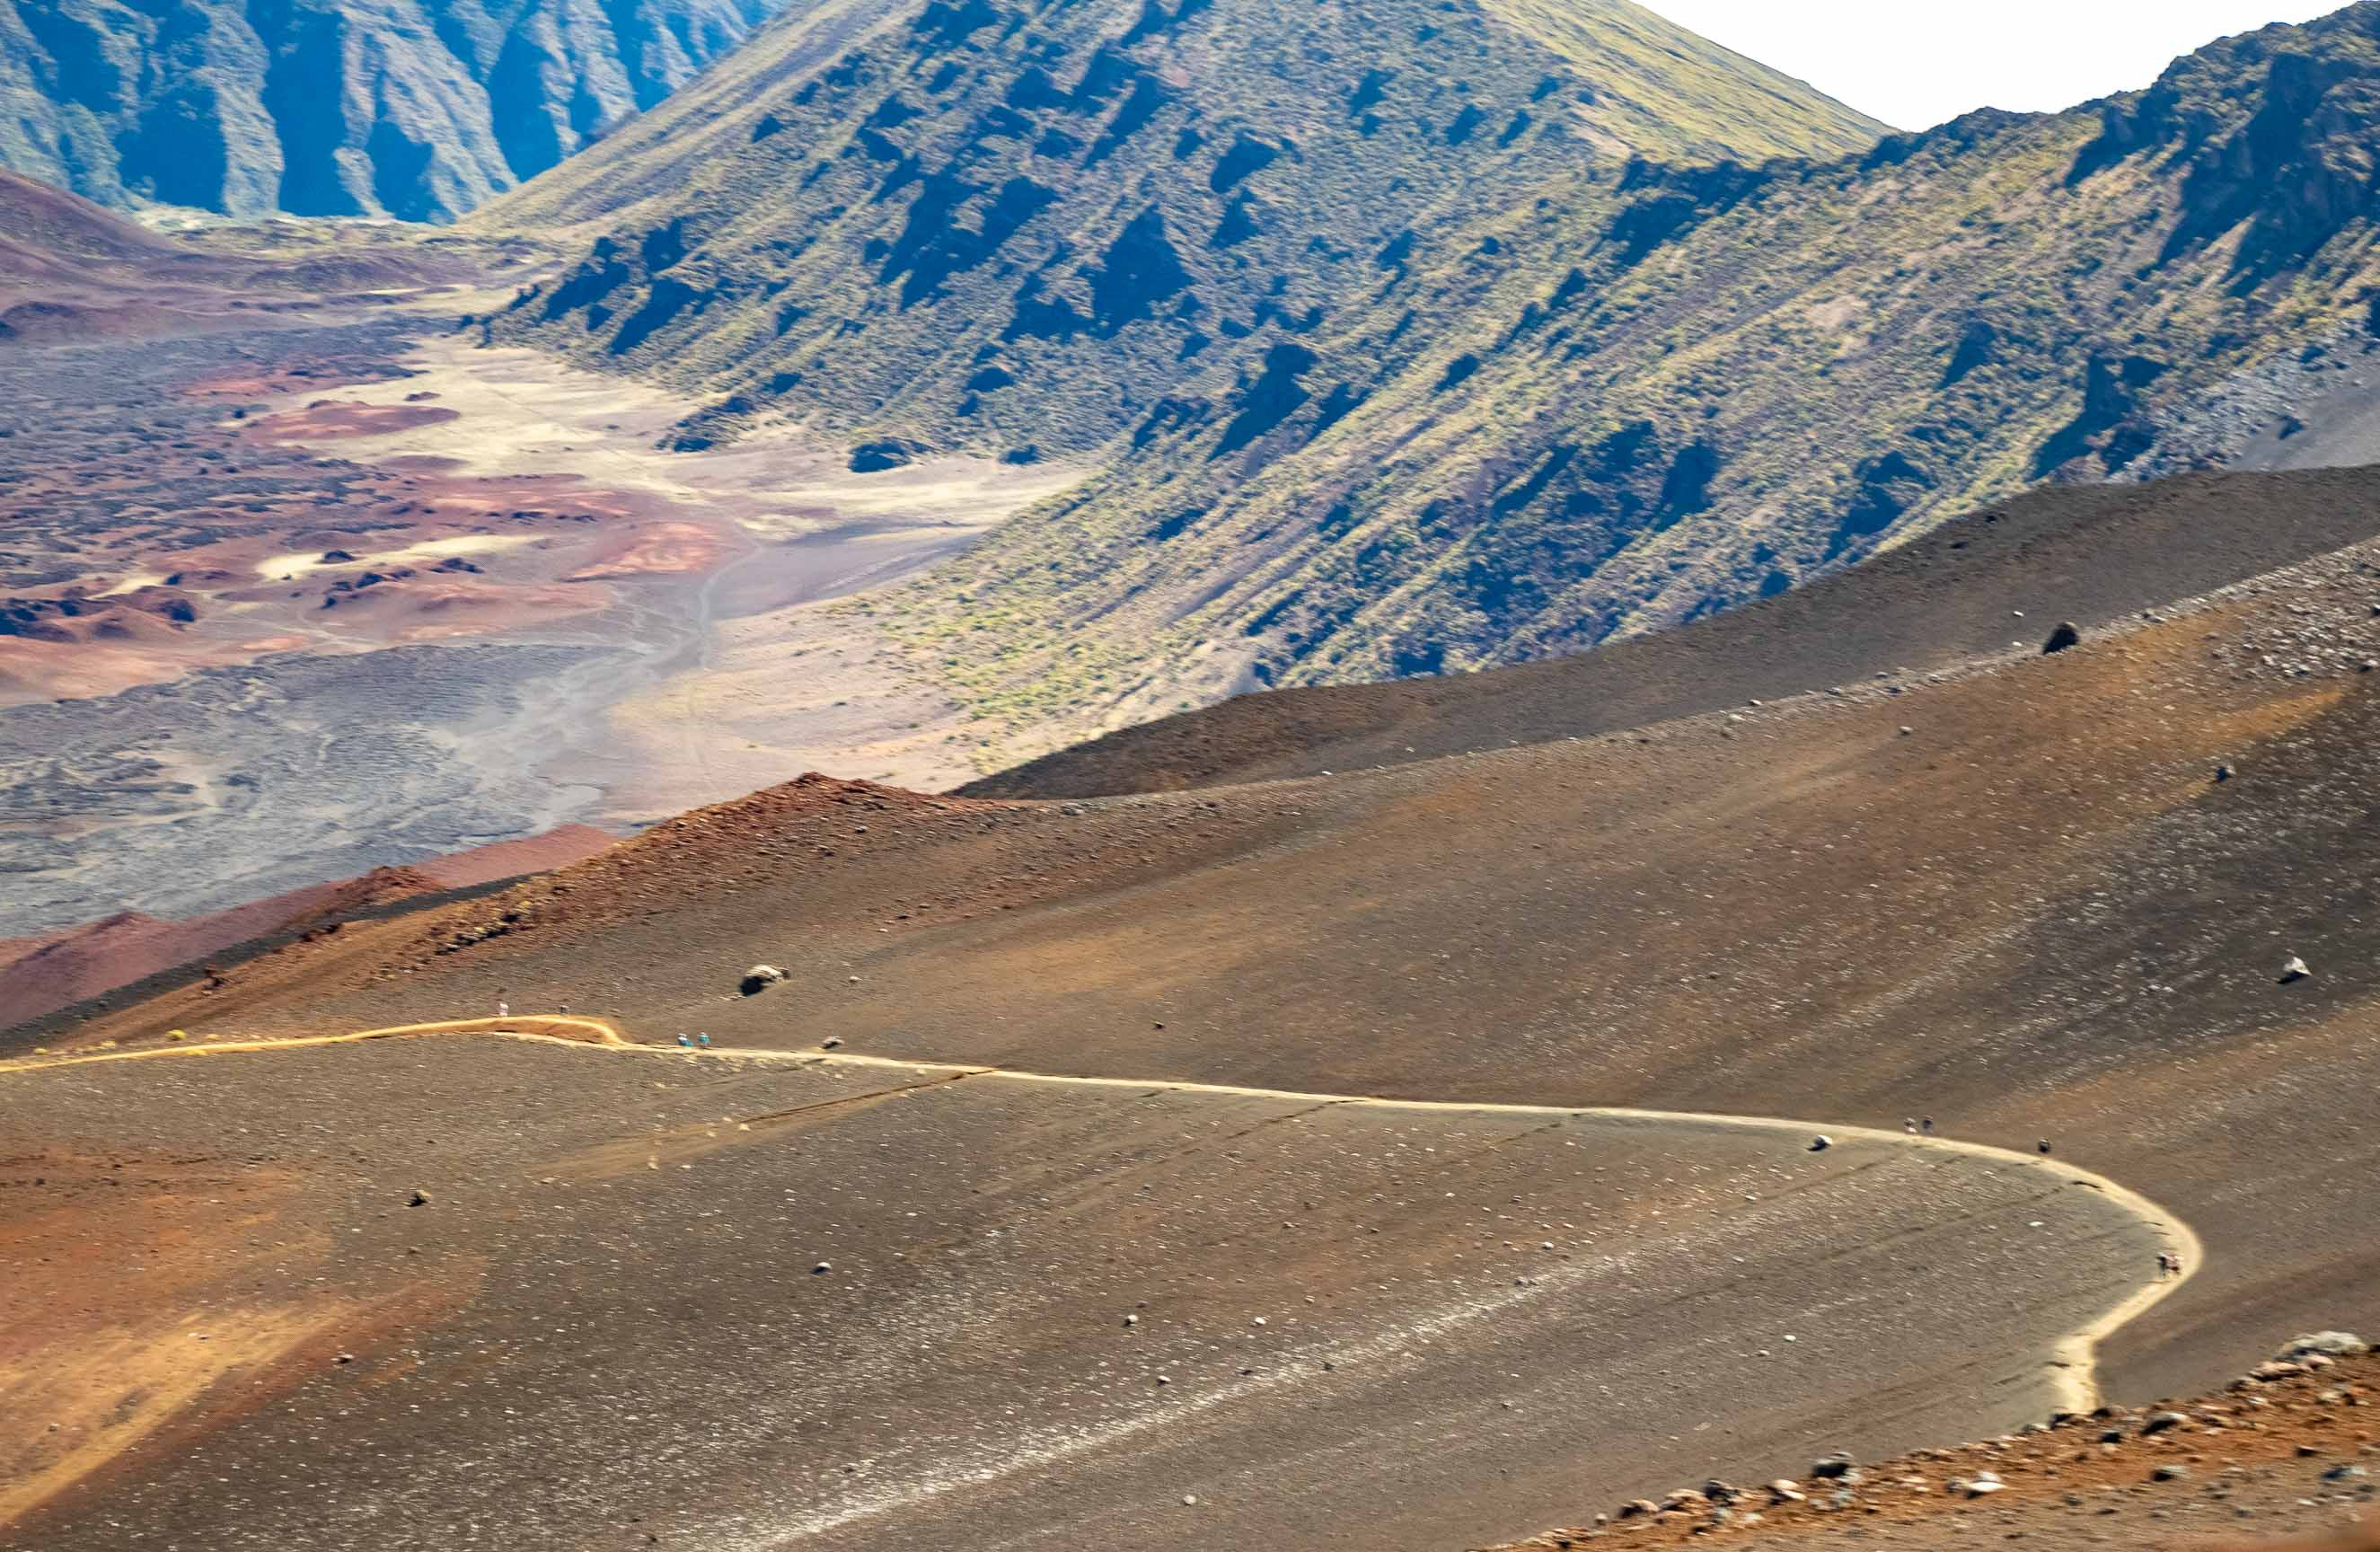 Haleakala Crater Sliding Sands Hiking Trail Maui